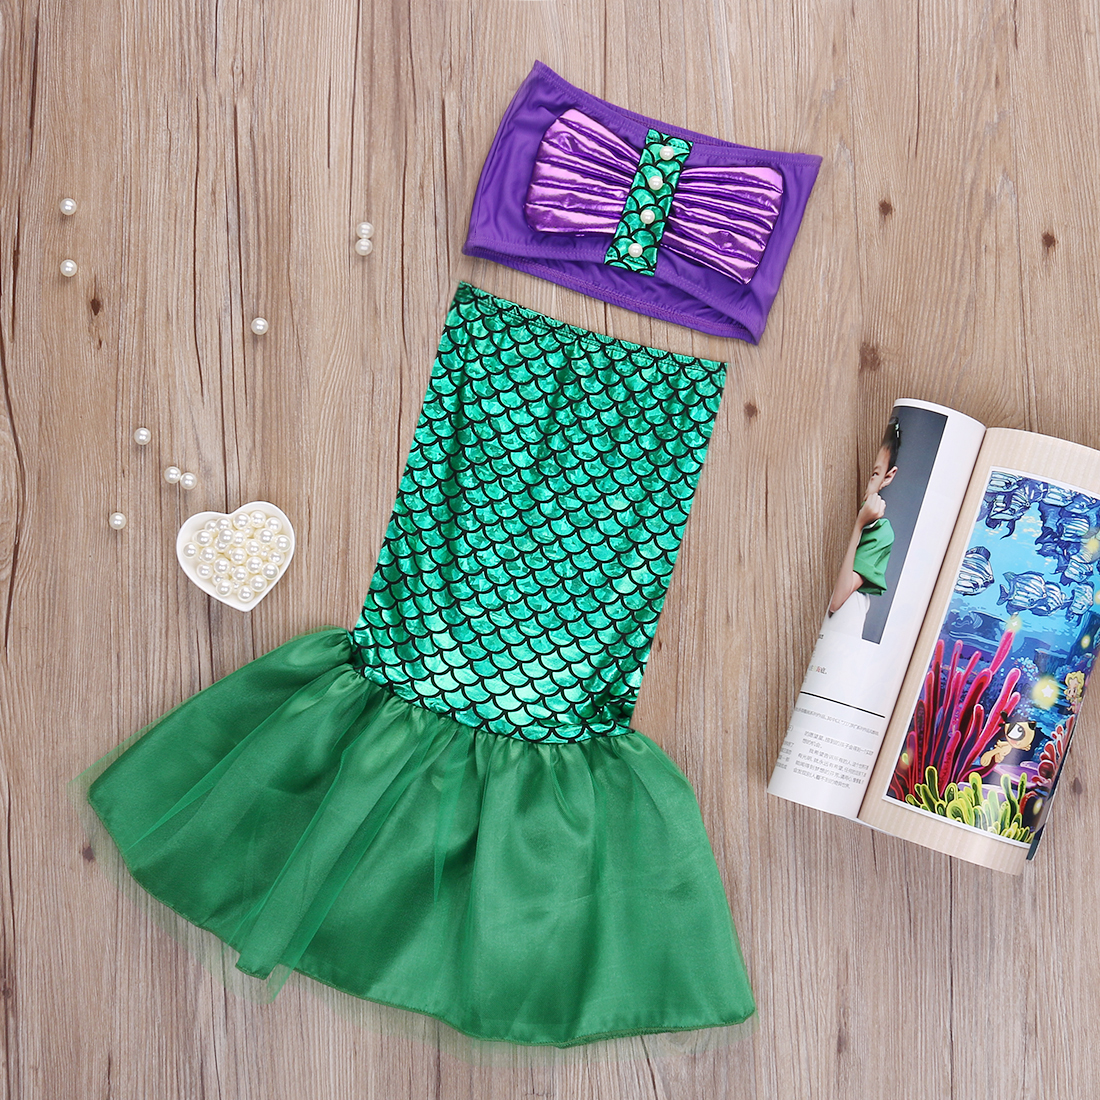 Halloween Baby Girls Mermaid Bikinis Set Costume Swimwear Outfits Dress  Cosplay Swimwear Wholesale Fashion Sundress-in Clothing Sets from Mother    Kids on ... 22a64f4bf79b